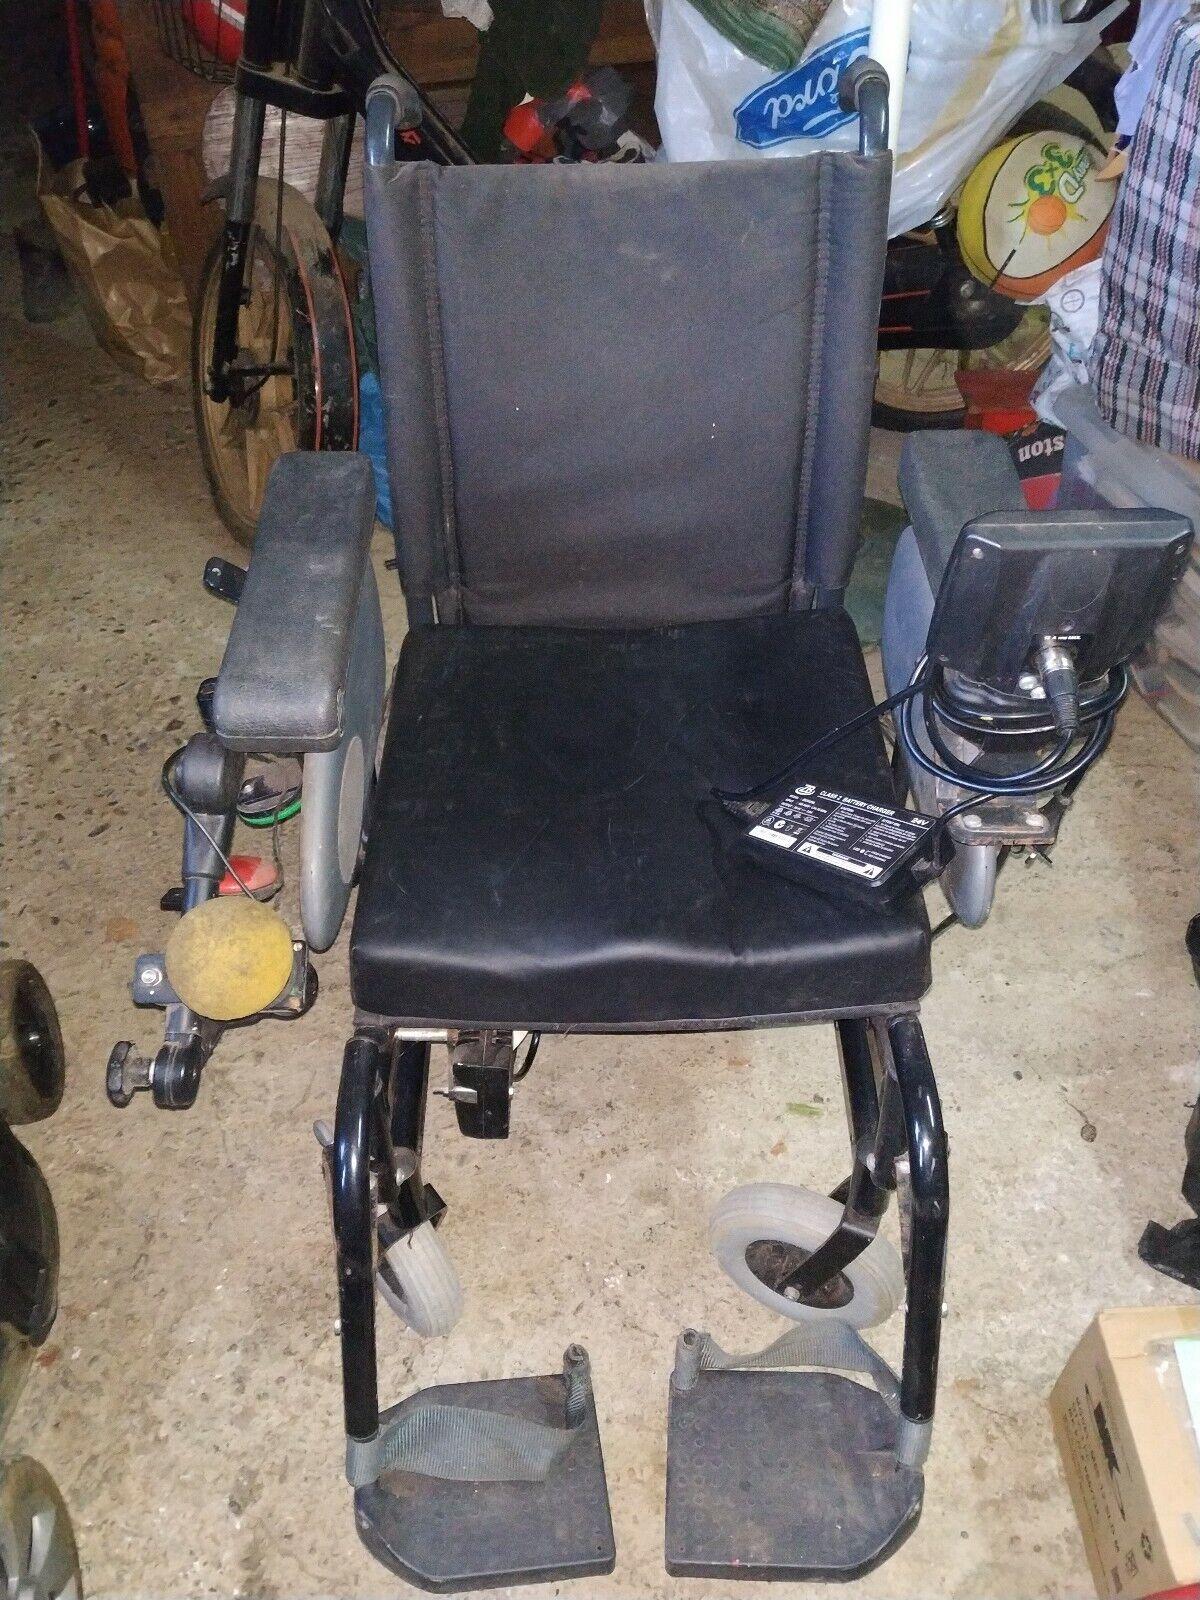 s l1600 - Silla de ruedas eléctrica